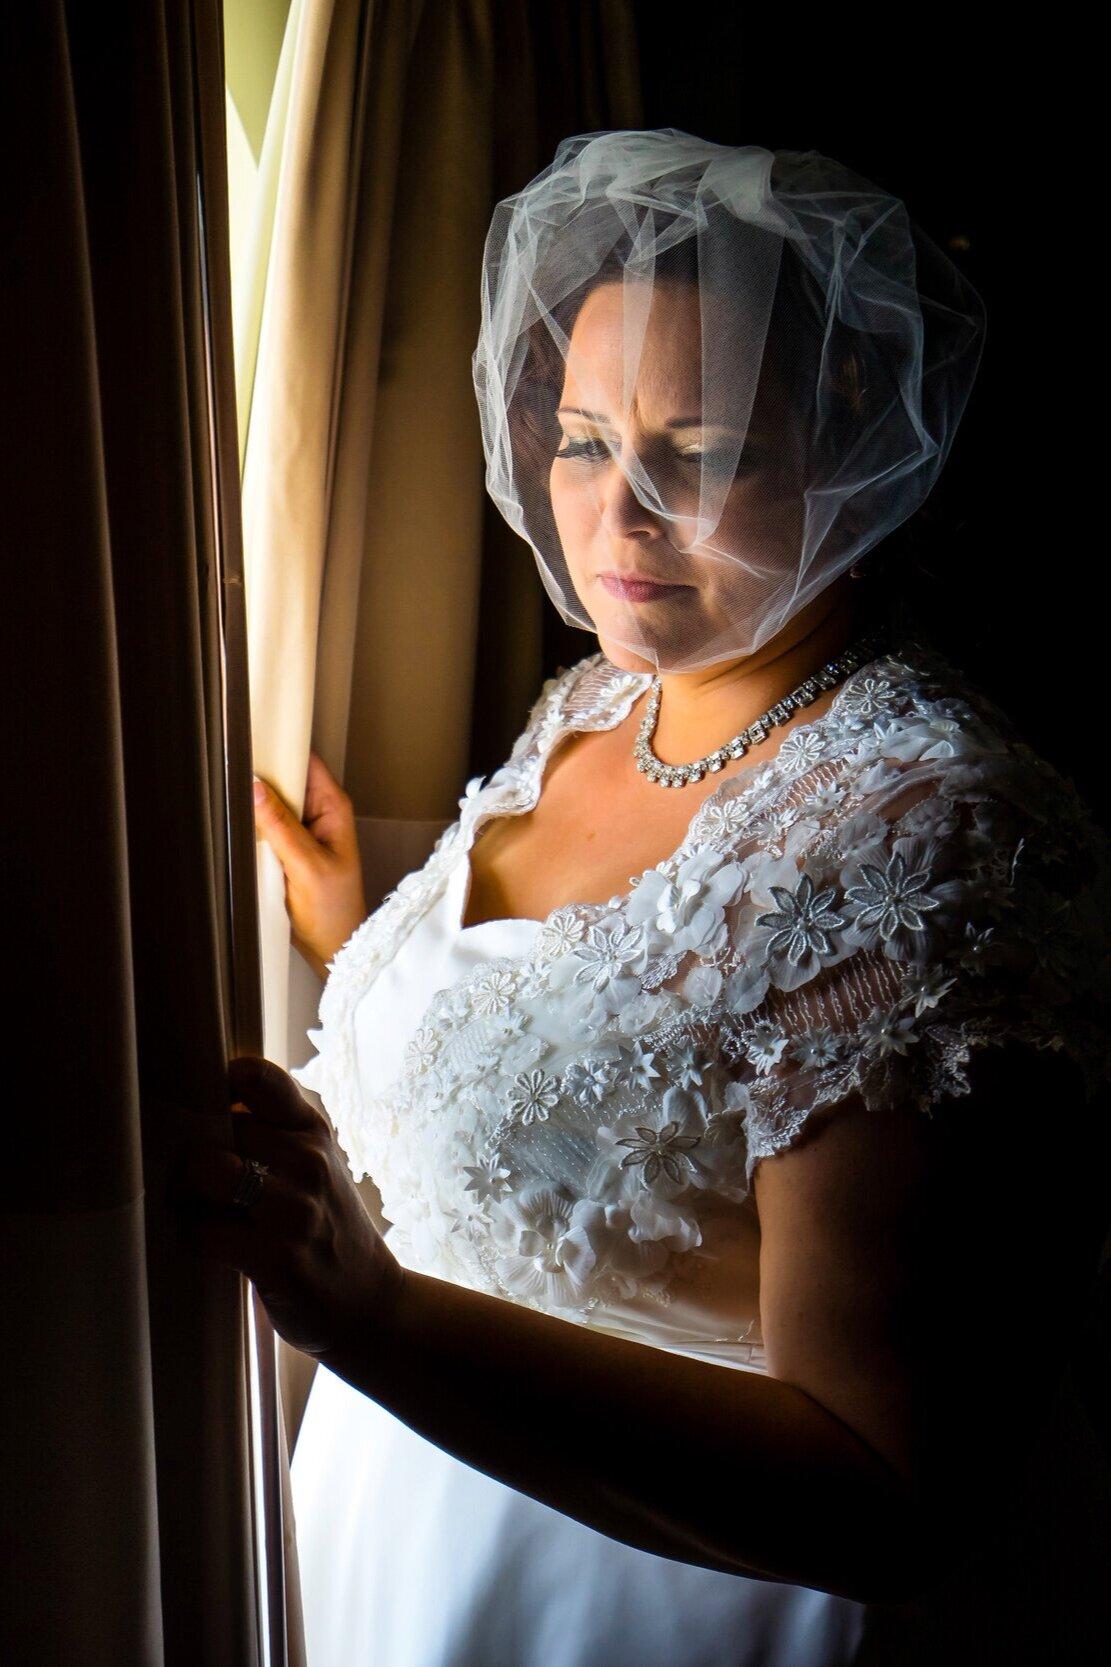 Vintage+bride+in+bespoke+wedding+dress+with+net+fascinator+opening+the+curtain.jpg